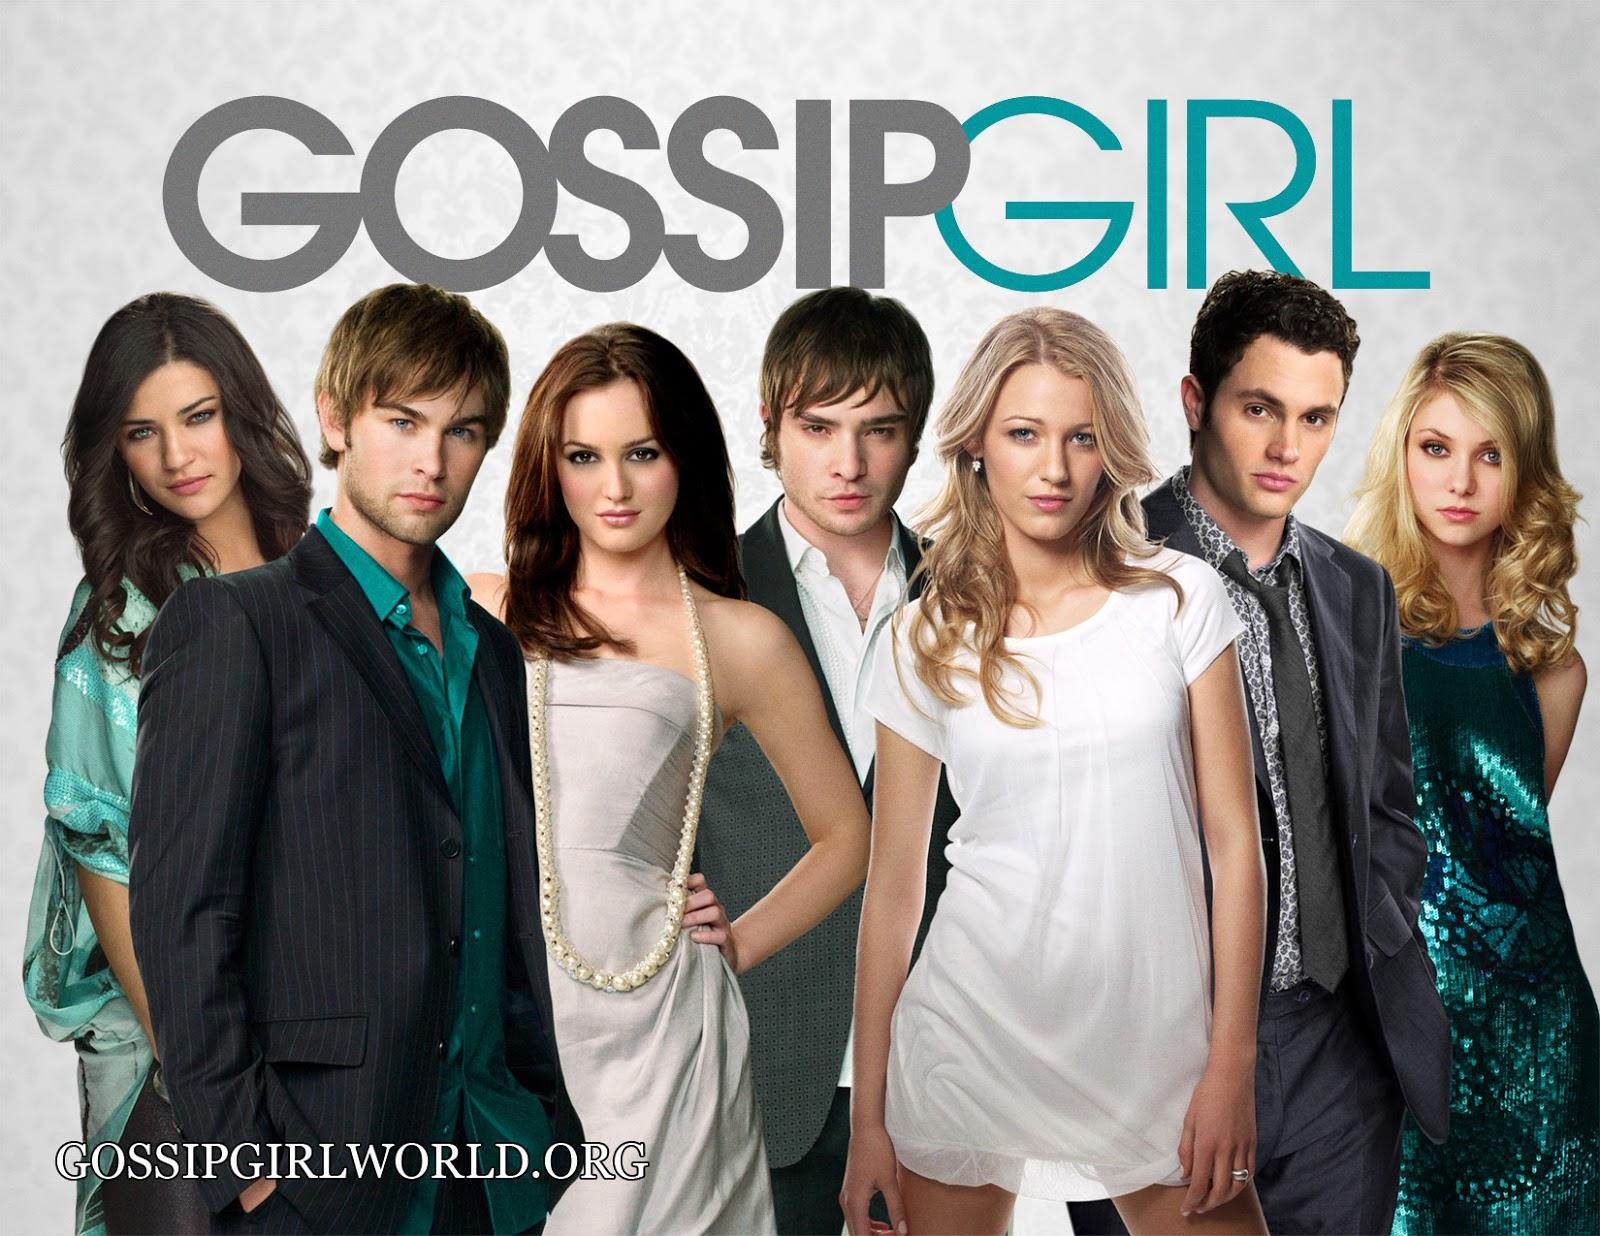 gossip girl 5 temporada dublado rmvb